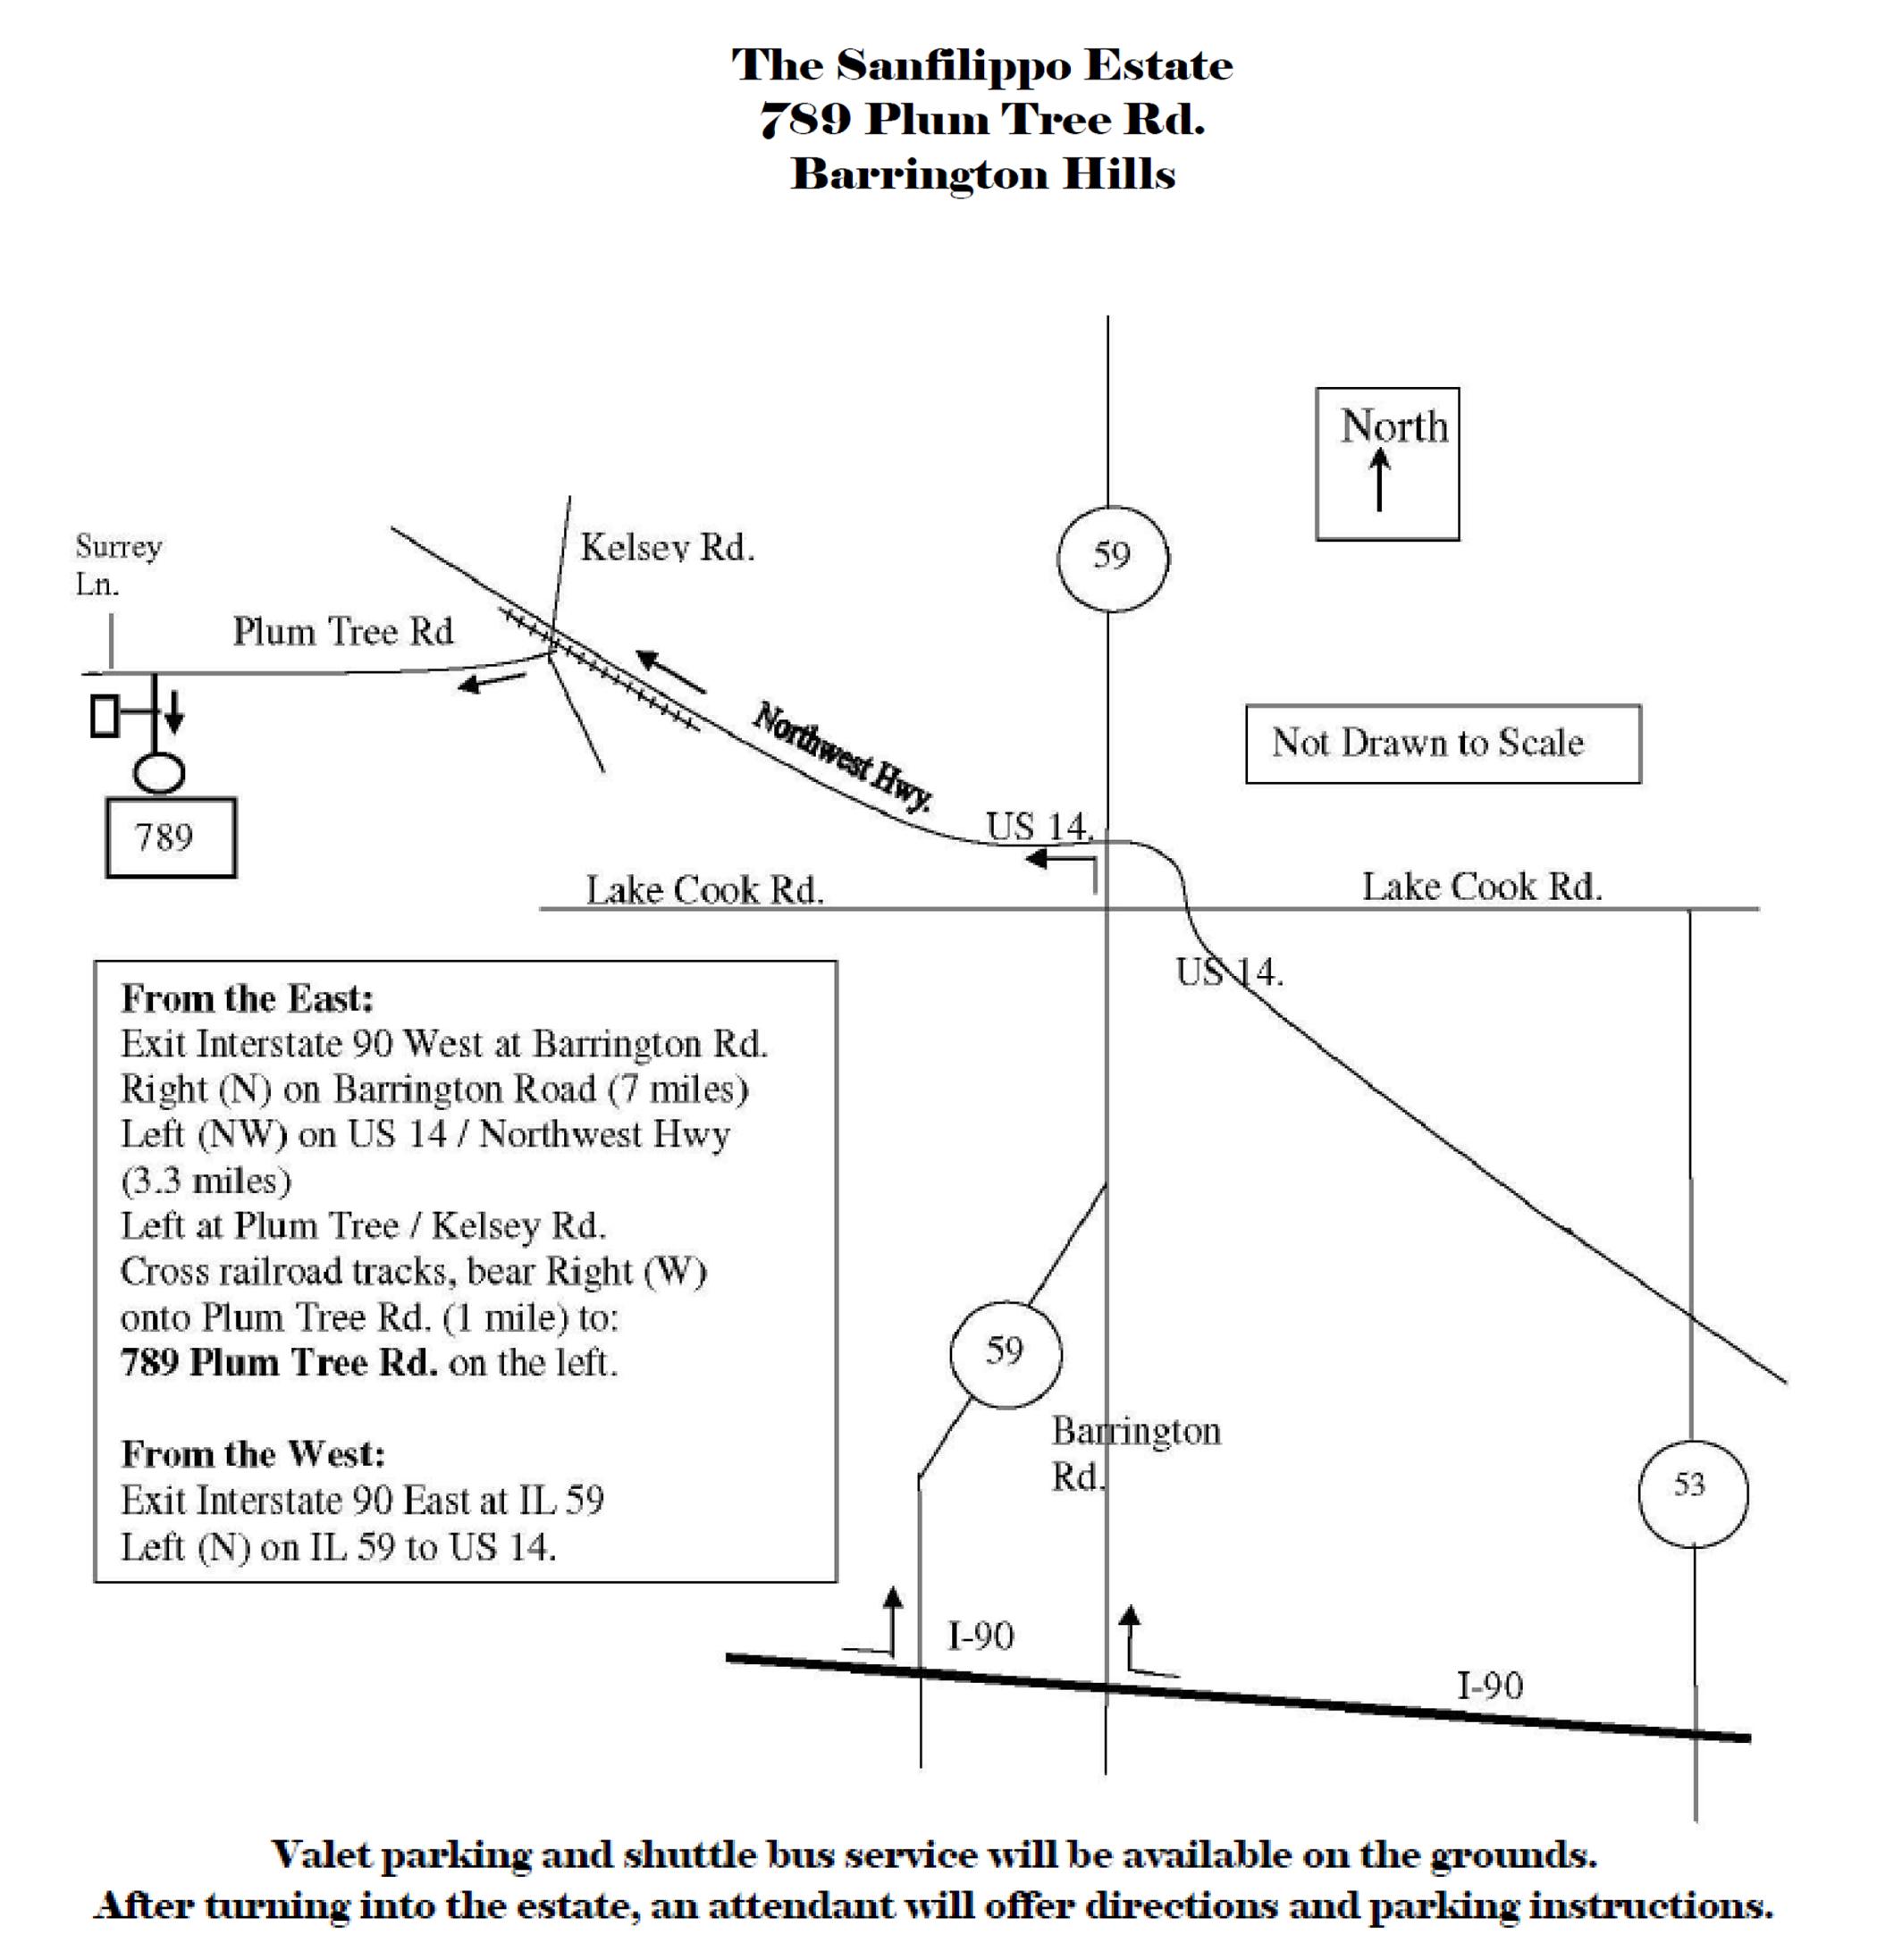 Directions to Sanfilippo Estate2